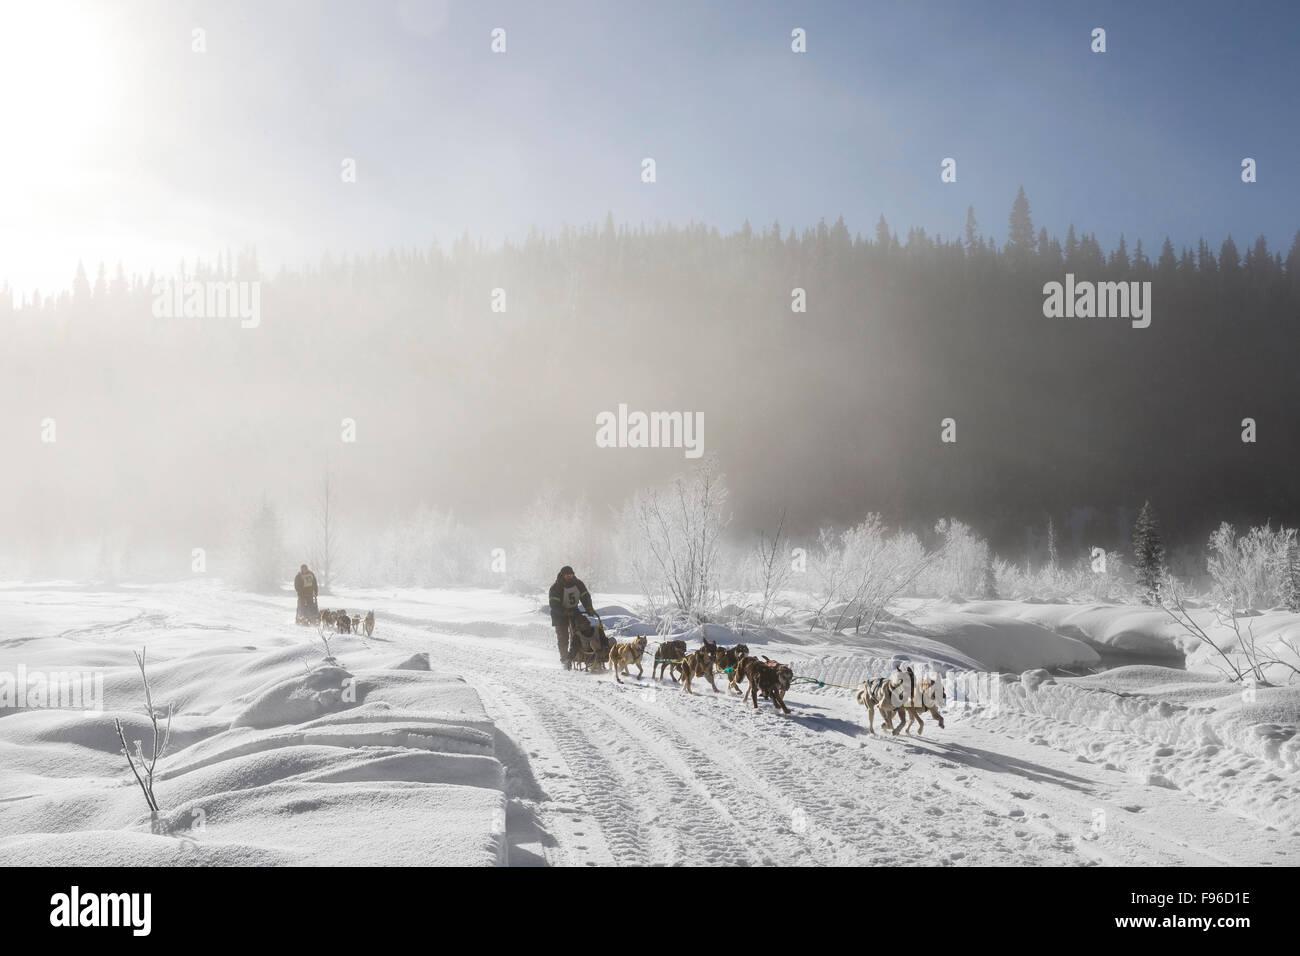 British Columbia, Canada, Gold Rush Dog Sled Mail Run, Barkervilel Area, North Cariboo region, mushers, dod sledding, - Stock Image